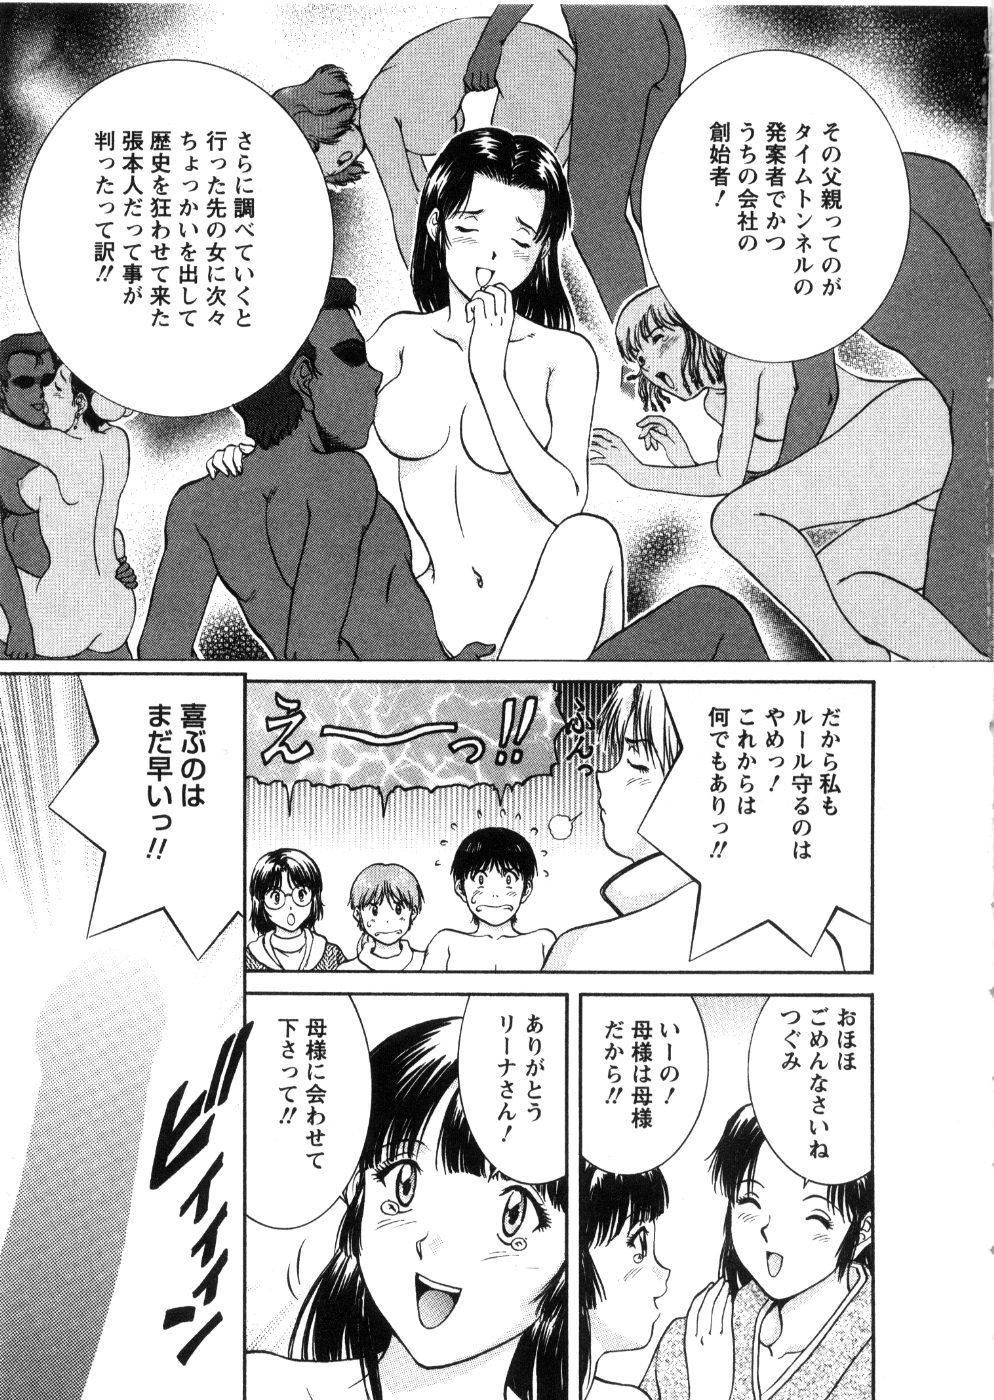 Oneechan-tachi ga Yatte Kuru 03 150